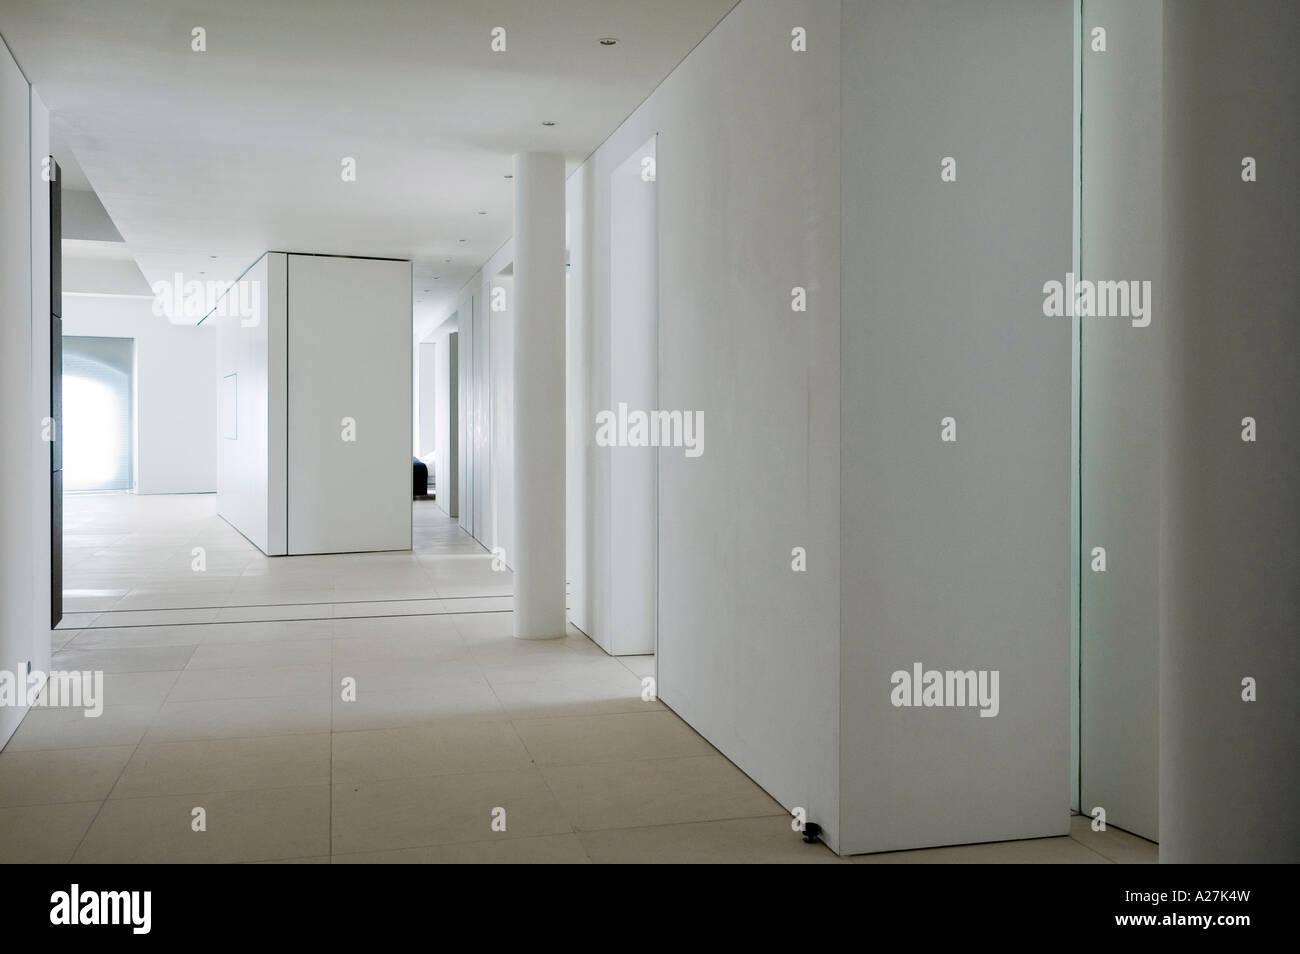 Hallway in minimalist warehouse conversion - Stock Image